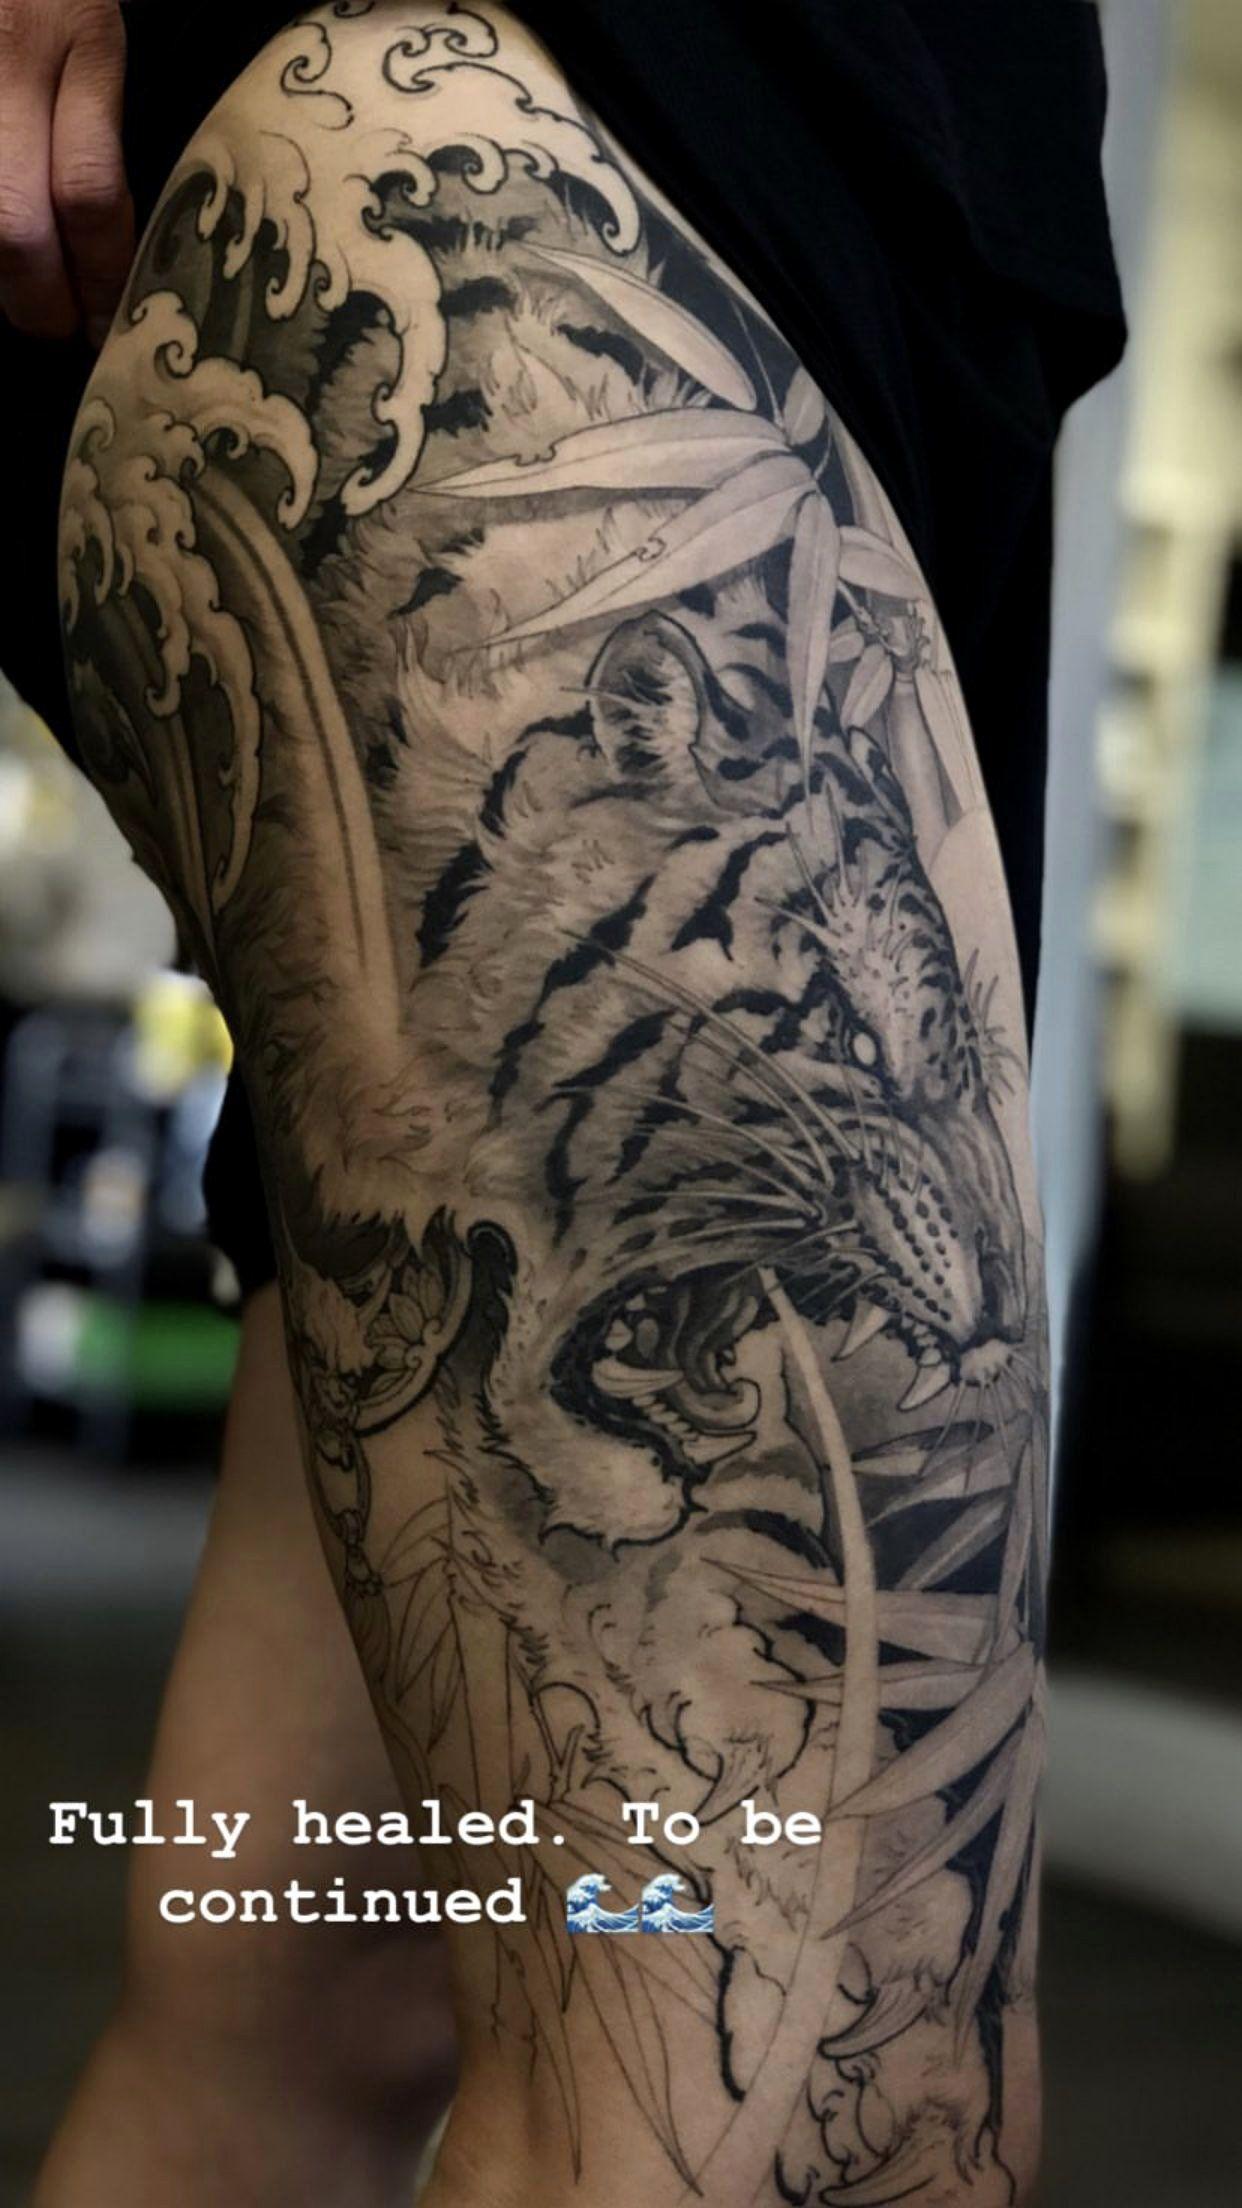 Japan Tiger Tattoo Designs Luxury Tattoos Tiger Japanese Tattoodesigns In 2020 Tiger Tattoo Sleeve Tiger Tattoo Design Sleeve Tattoos